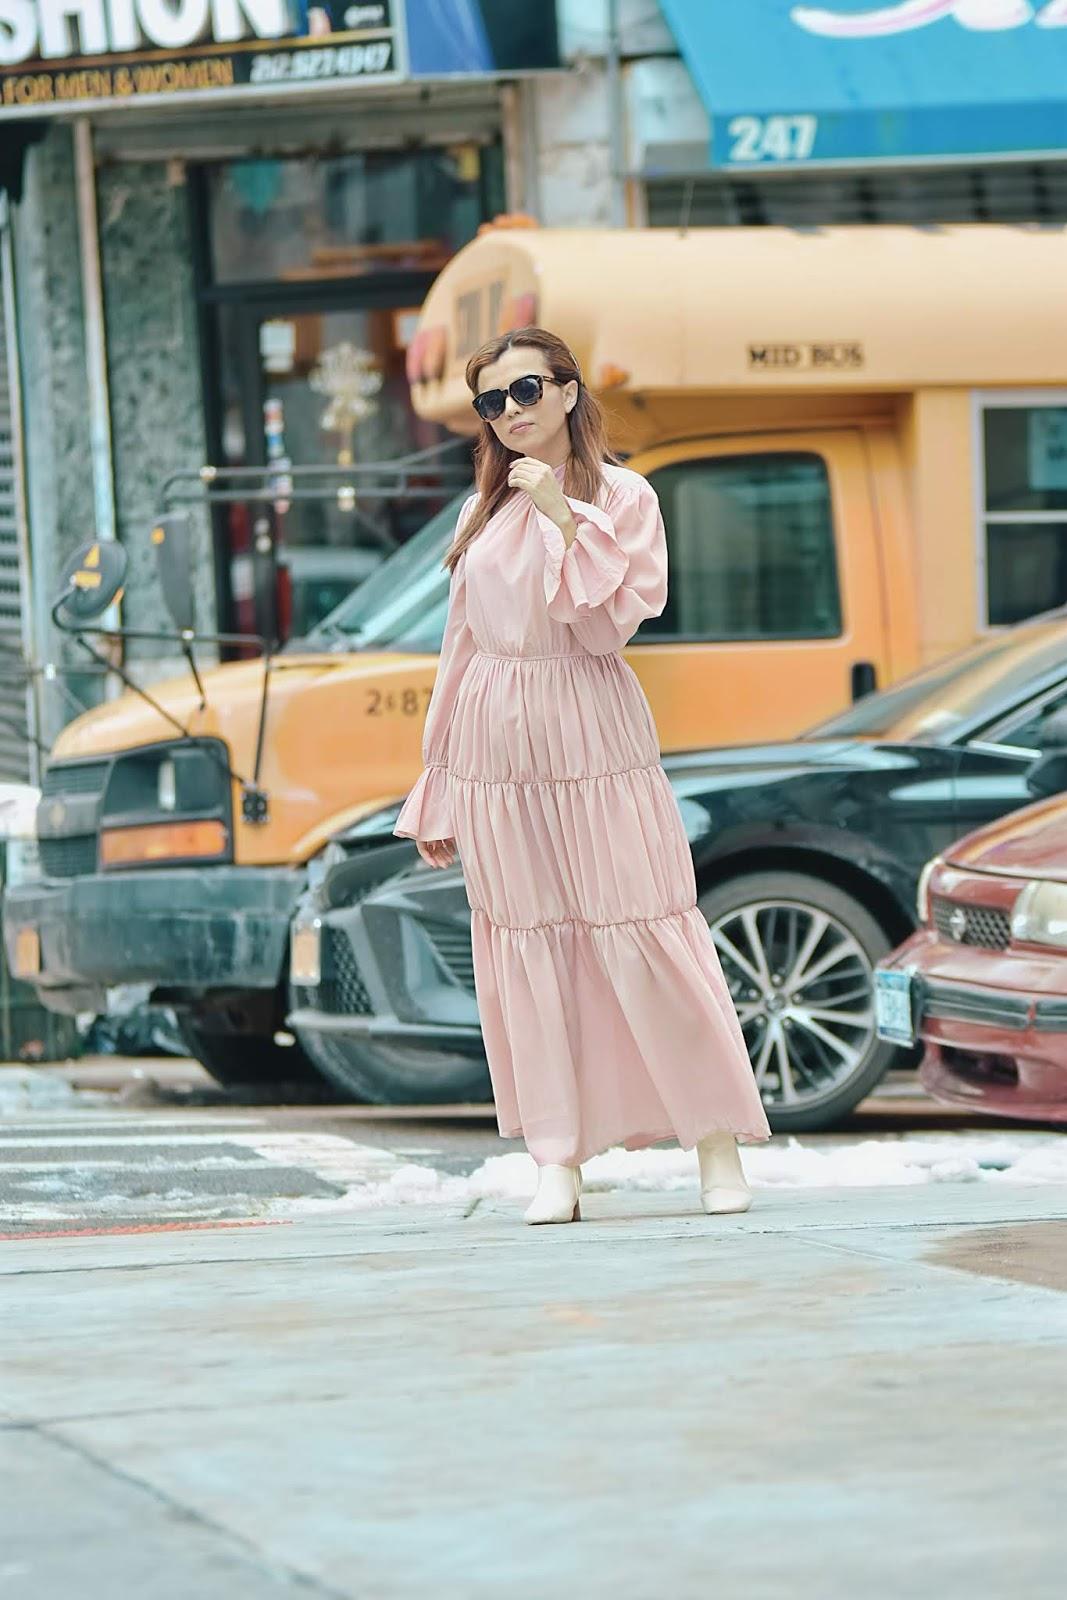 Romantic Vintage Dress by Mari Estilo-FashionBlogger-nyfw-nyfwstreetstyle-dcblogger-marisolflamenco-modaelsalvador-shein-